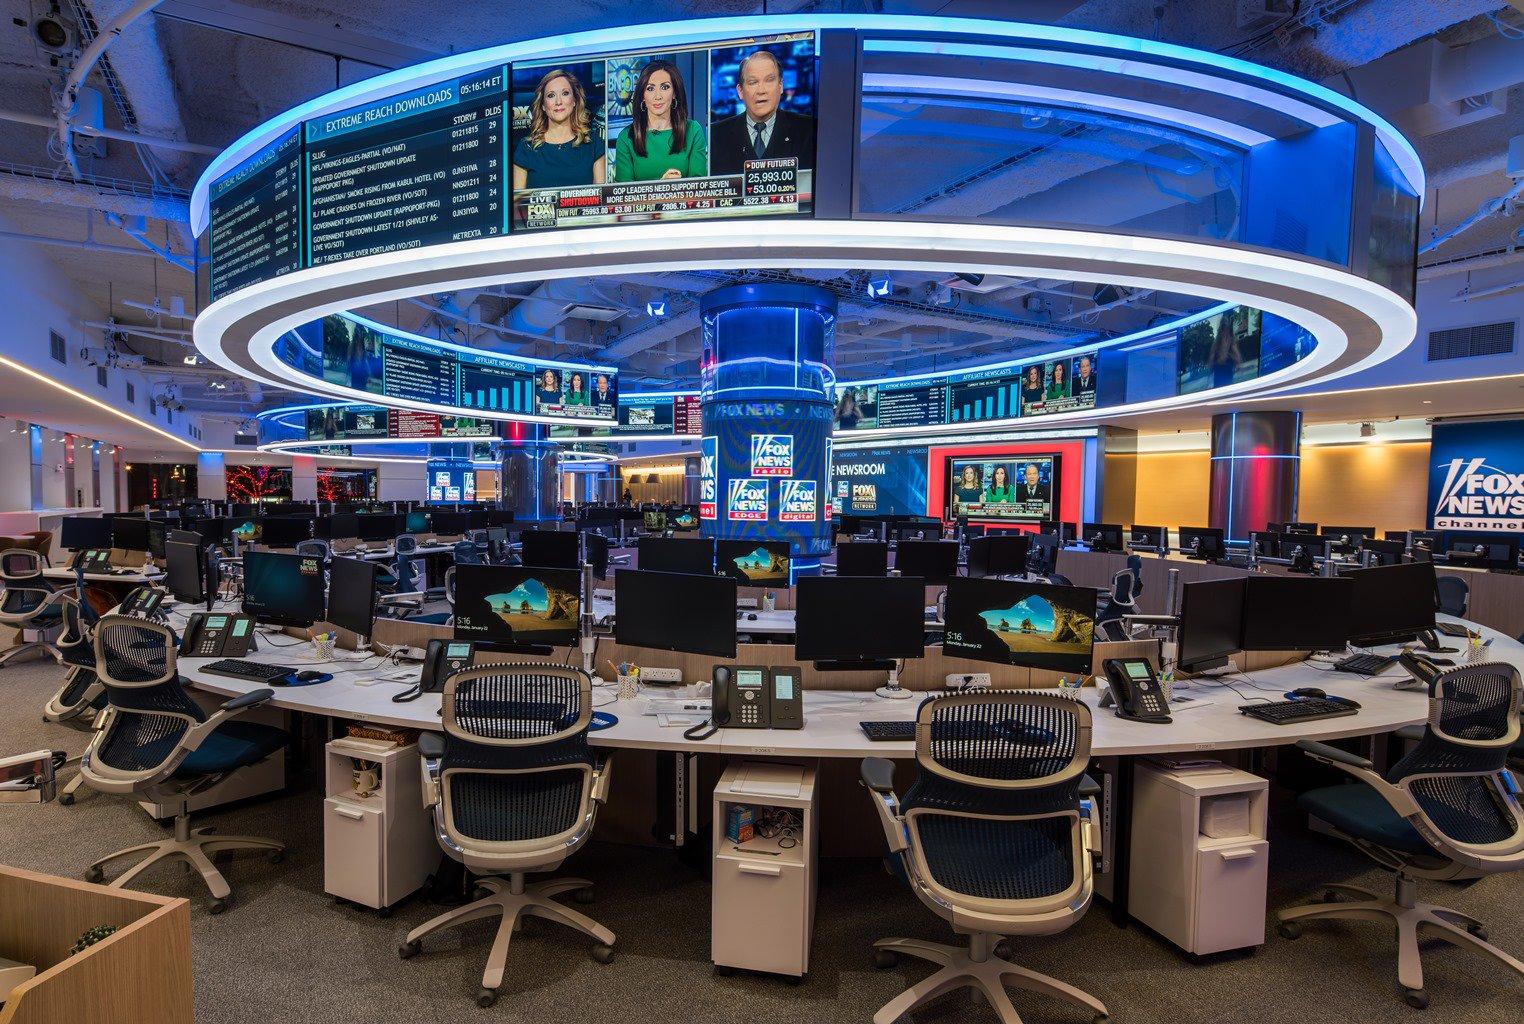 FOX NEWS CHANNEL Debuts new newsroom/Studio: The channel ...